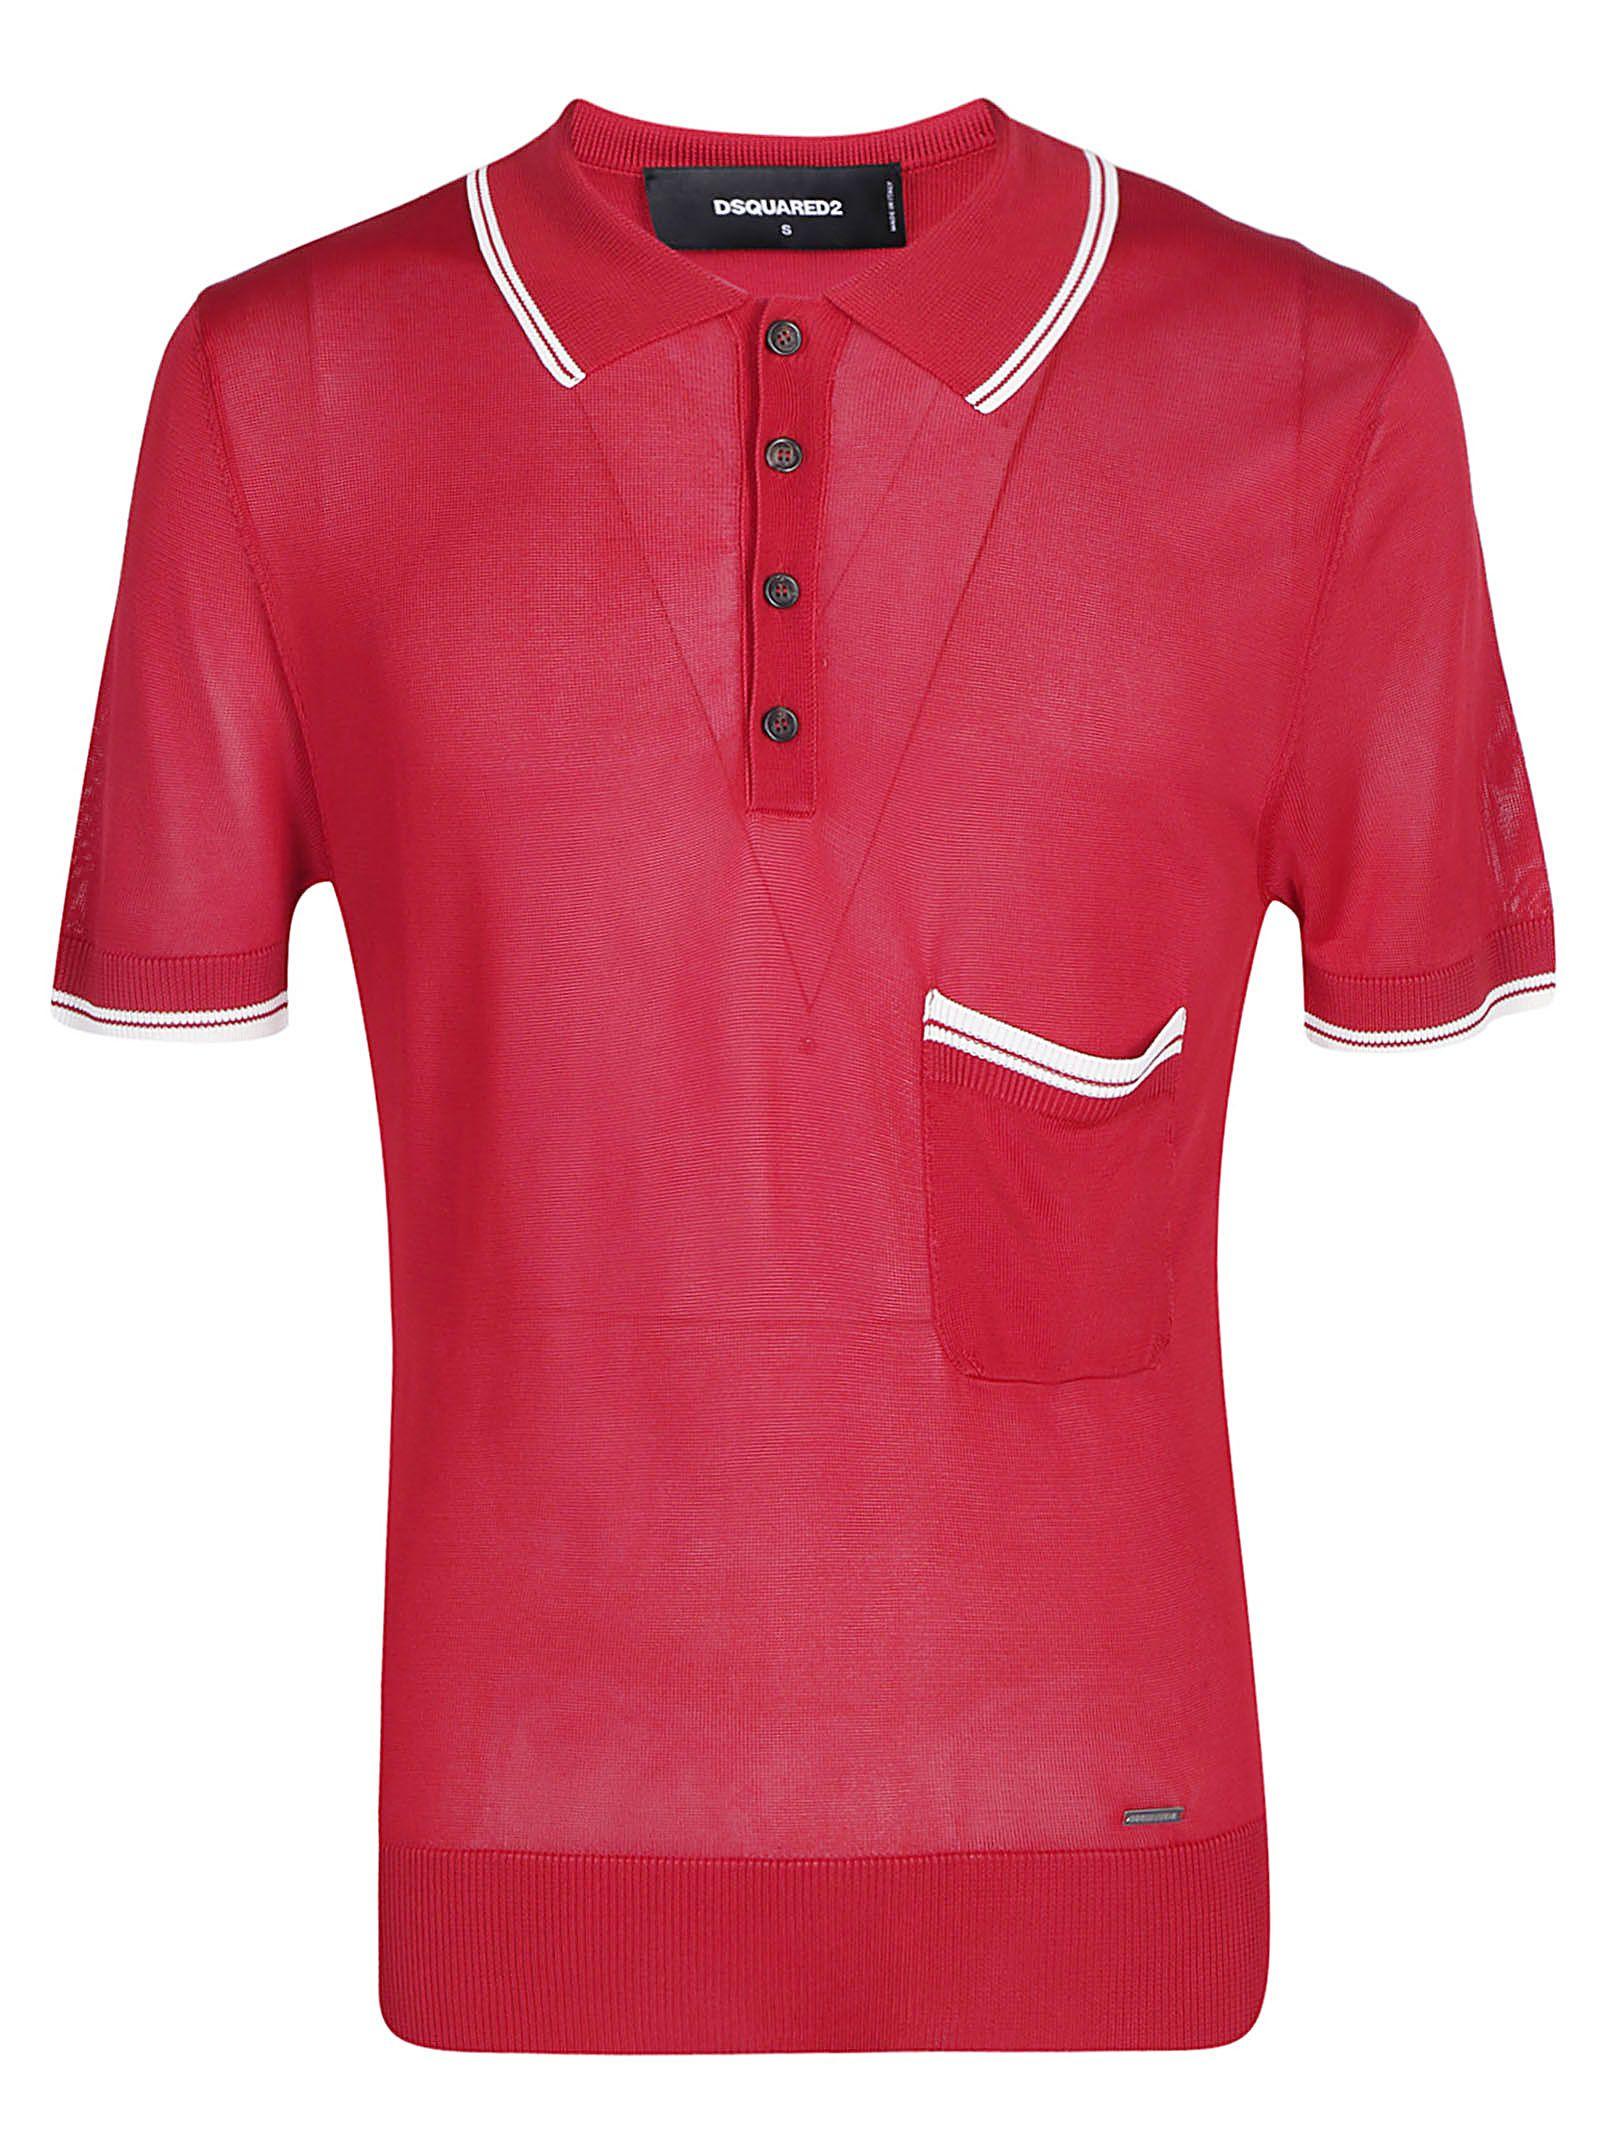 10b4cfa4 Dsquared2 Dsquared2 Knit Polo Shirt - Red/white - 10925873 | italist